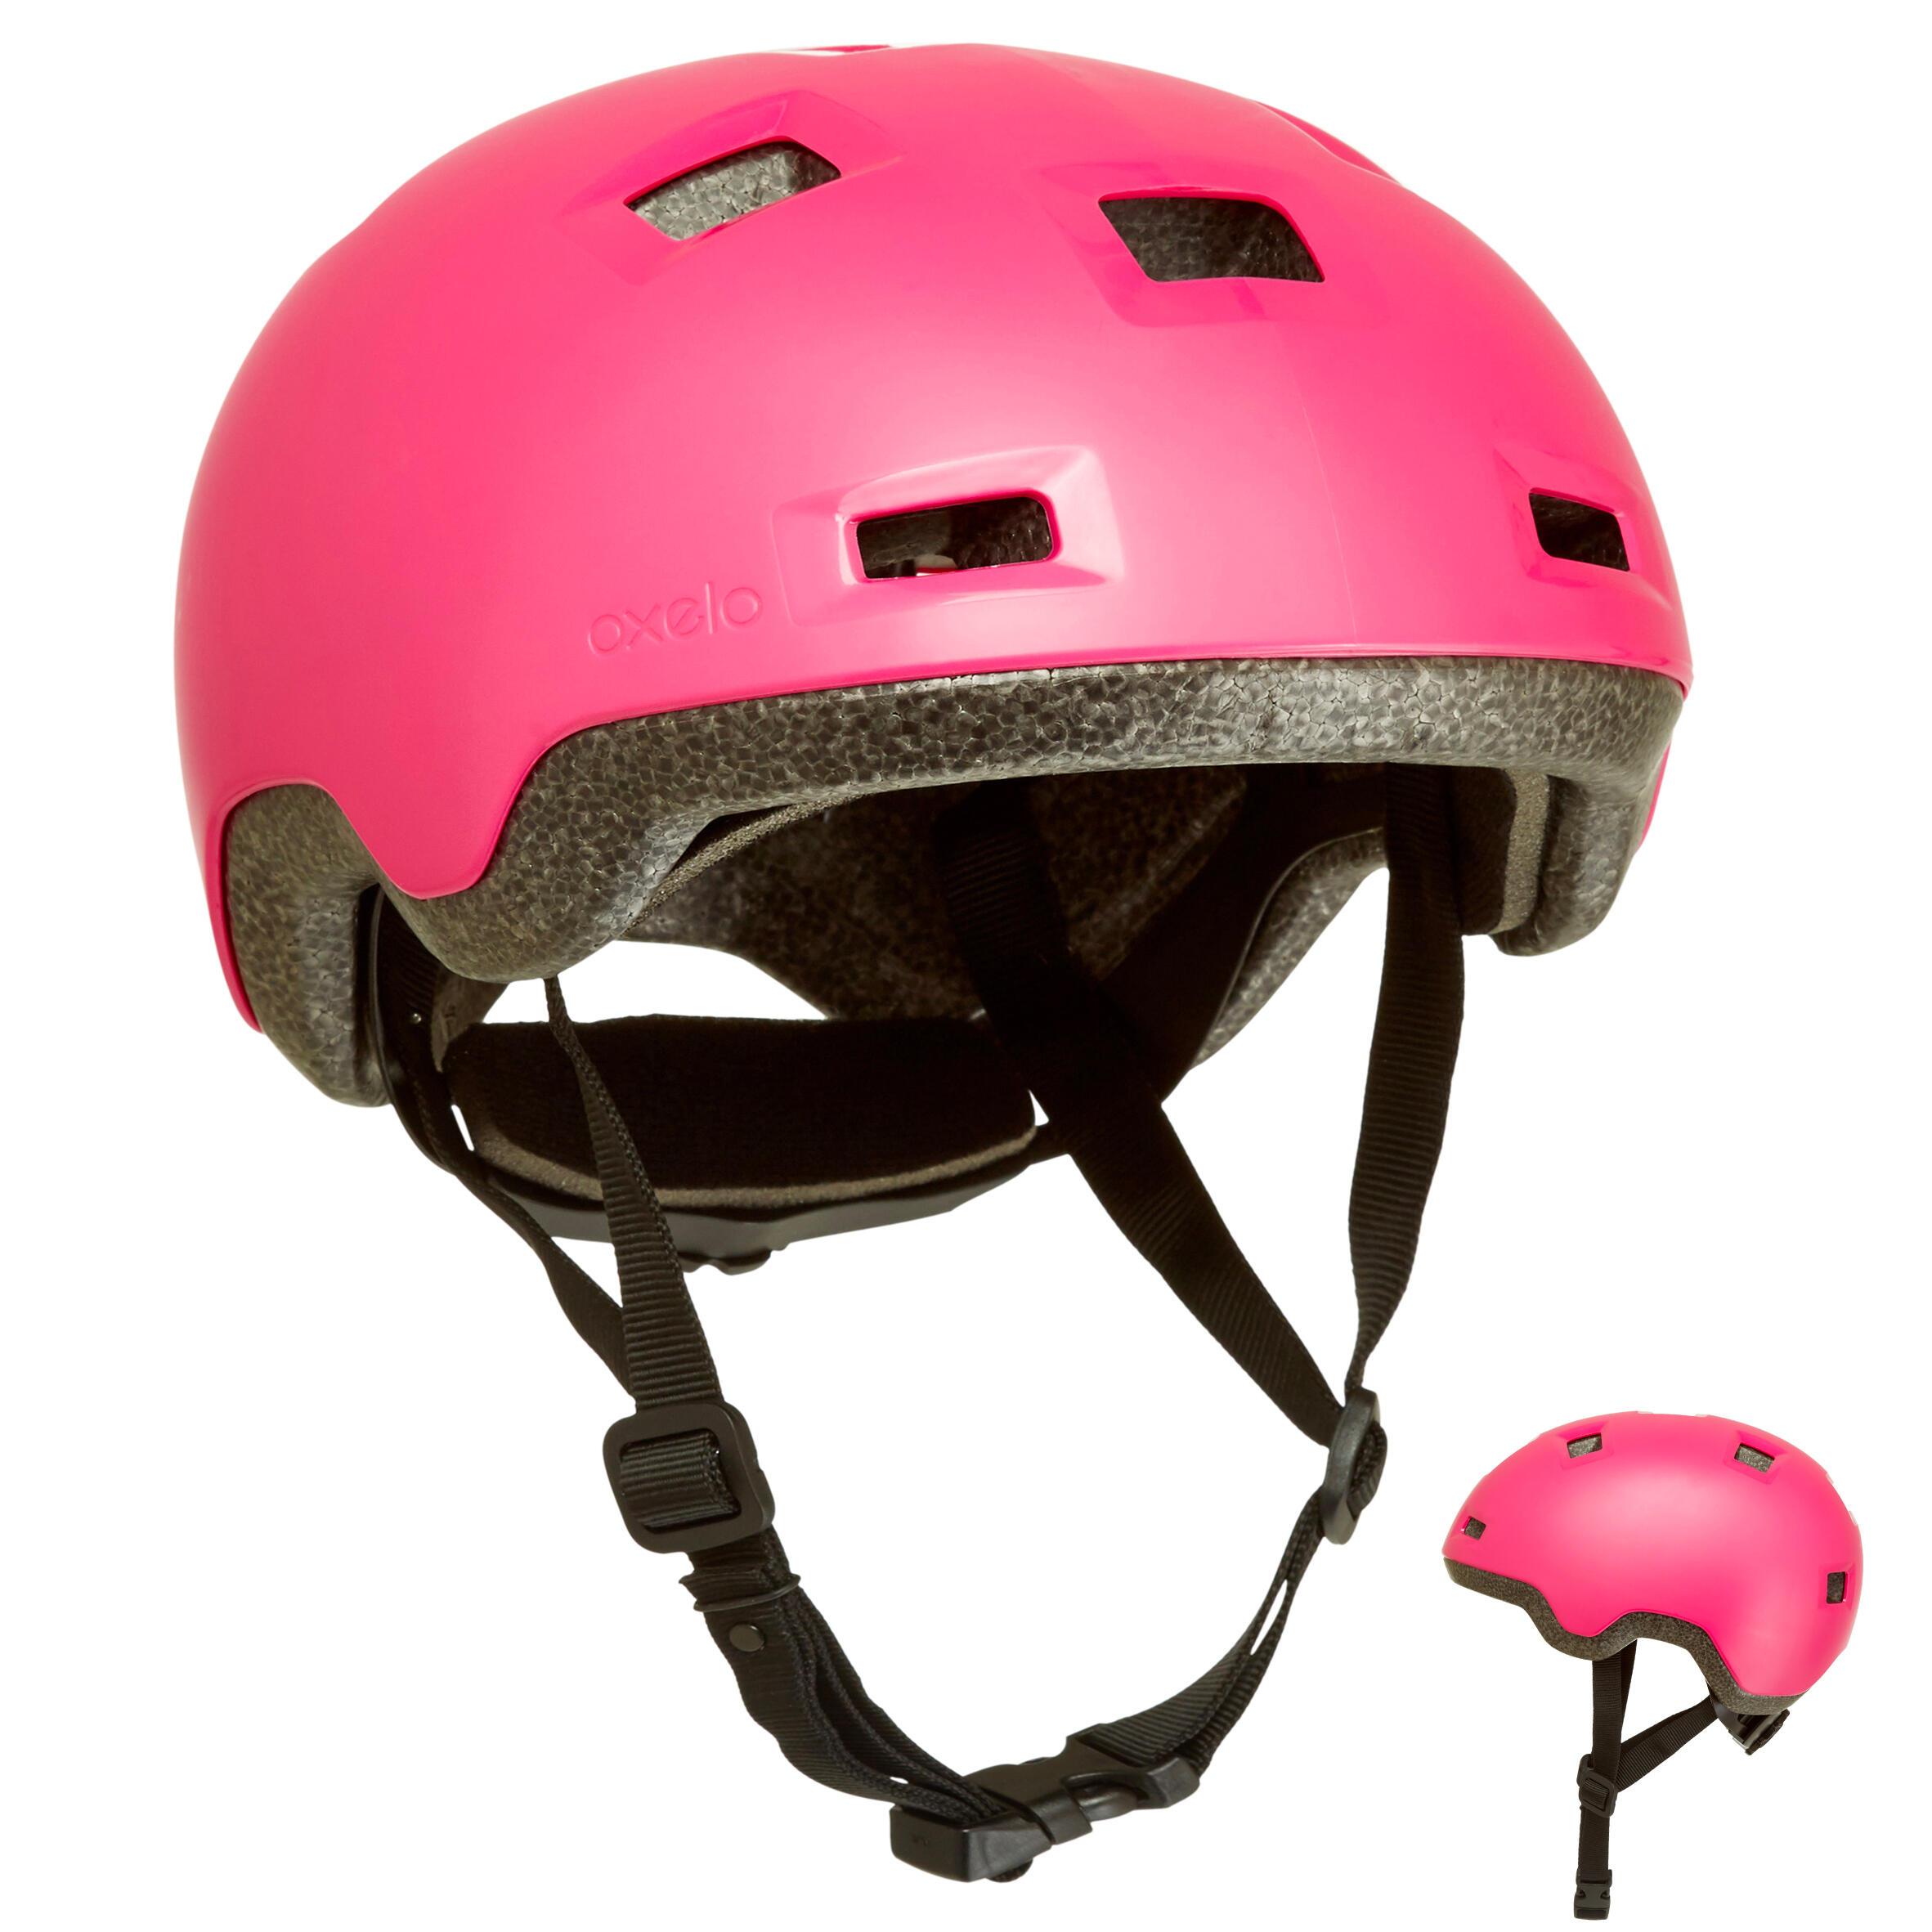 Casco para patines, patín del diablo, patineta, bicicleta B100 rosa